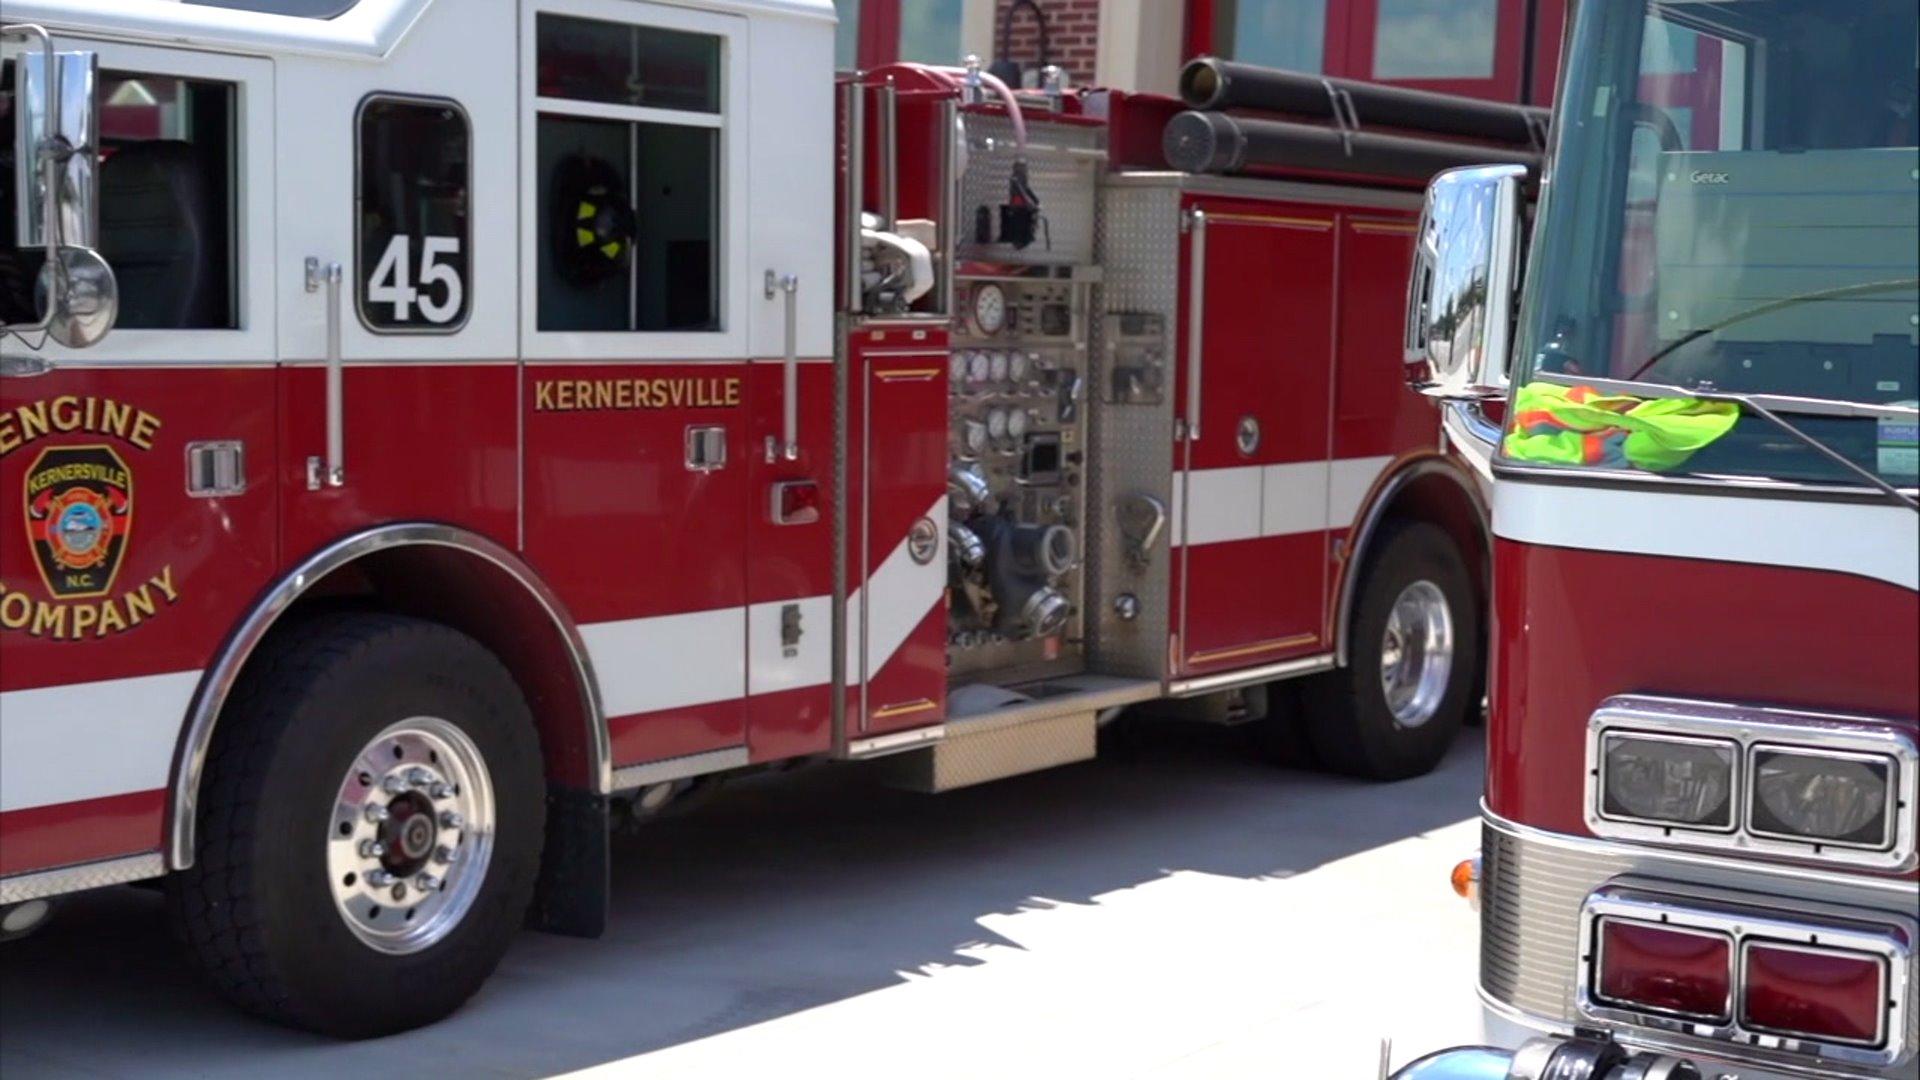 Kernersville Fire Department trucks (WGHP file photo)